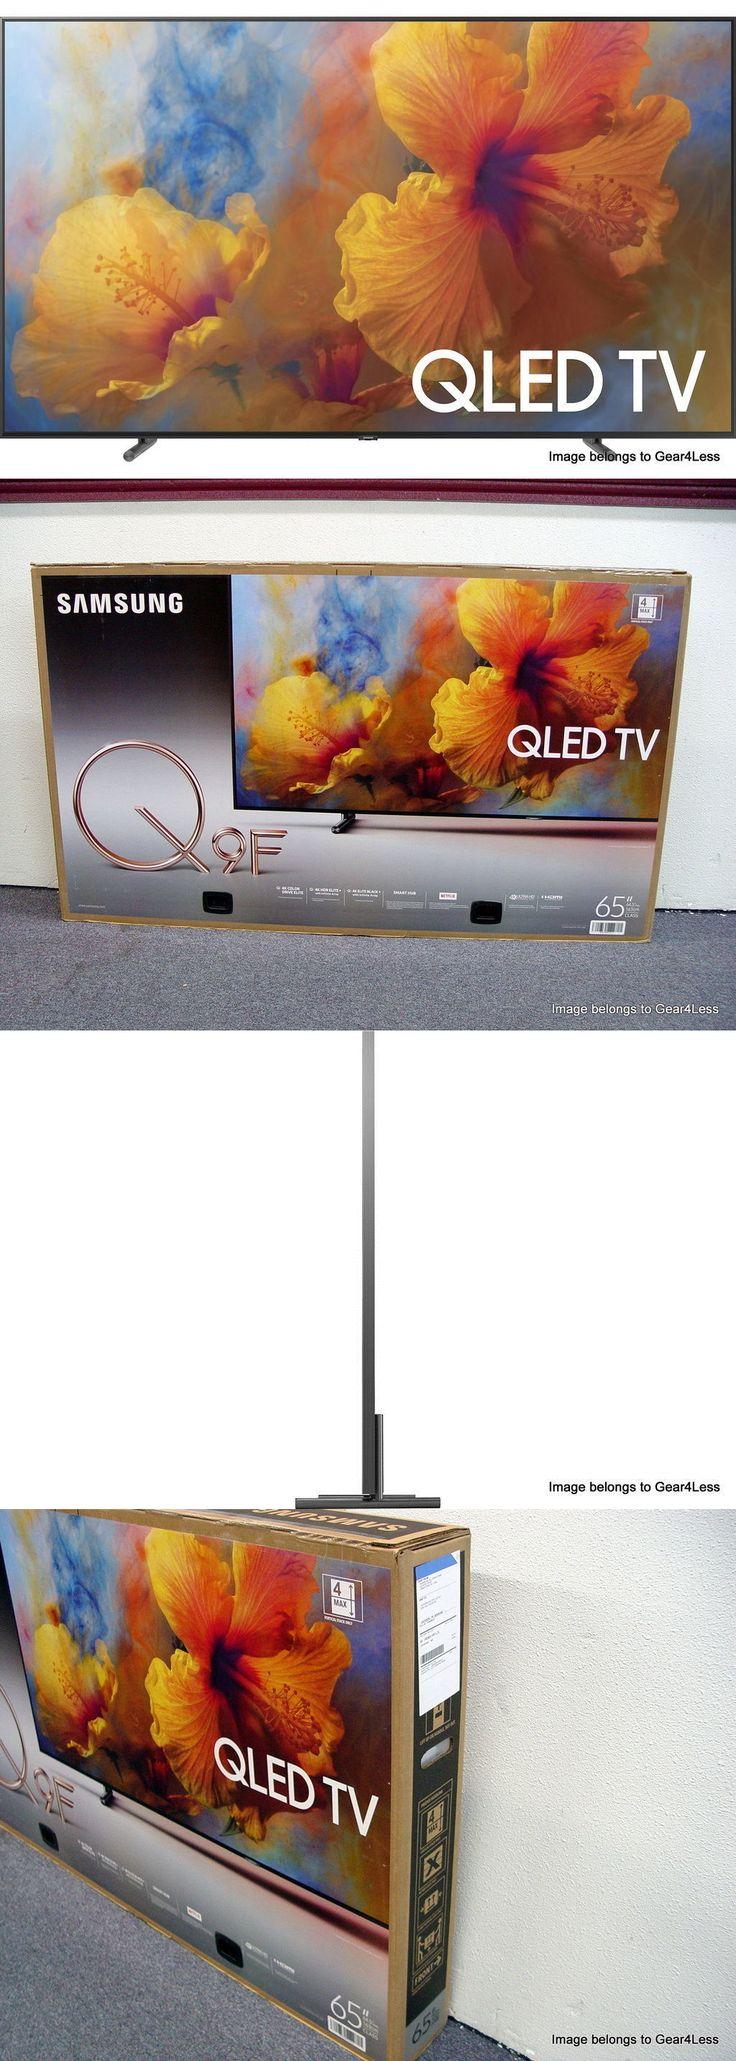 Televisions: Samsung 65Q9f 65 Smart Qled 4K Ultra Hd Tv Hdr Qn65q9f New Q Led Hdr 2017 -> BUY IT NOW ONLY: $3298.95 on eBay!